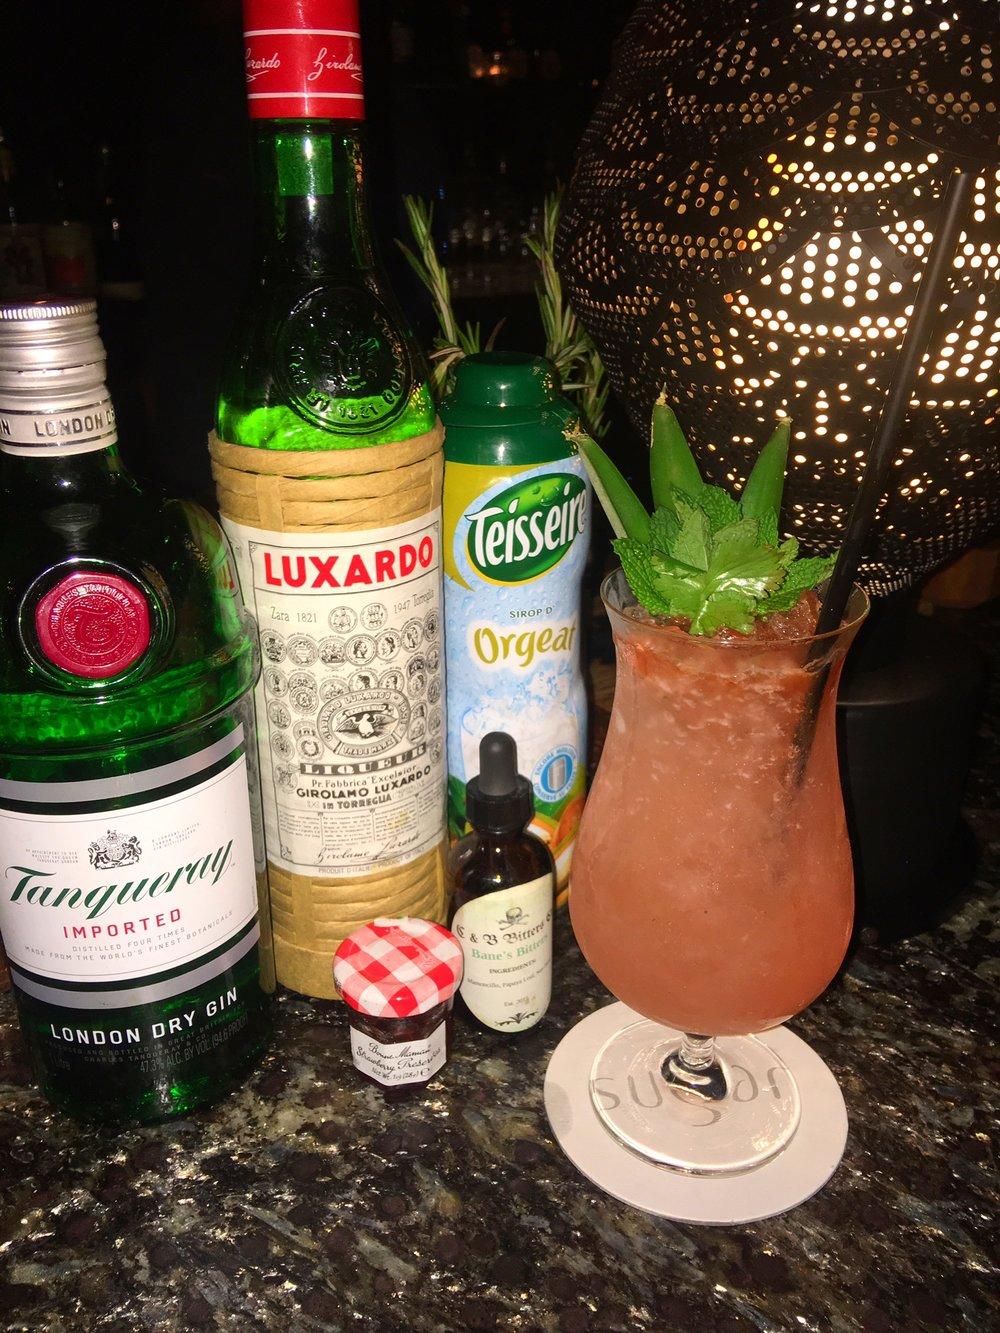 Sugar, EAST Hotel cocktail Miami